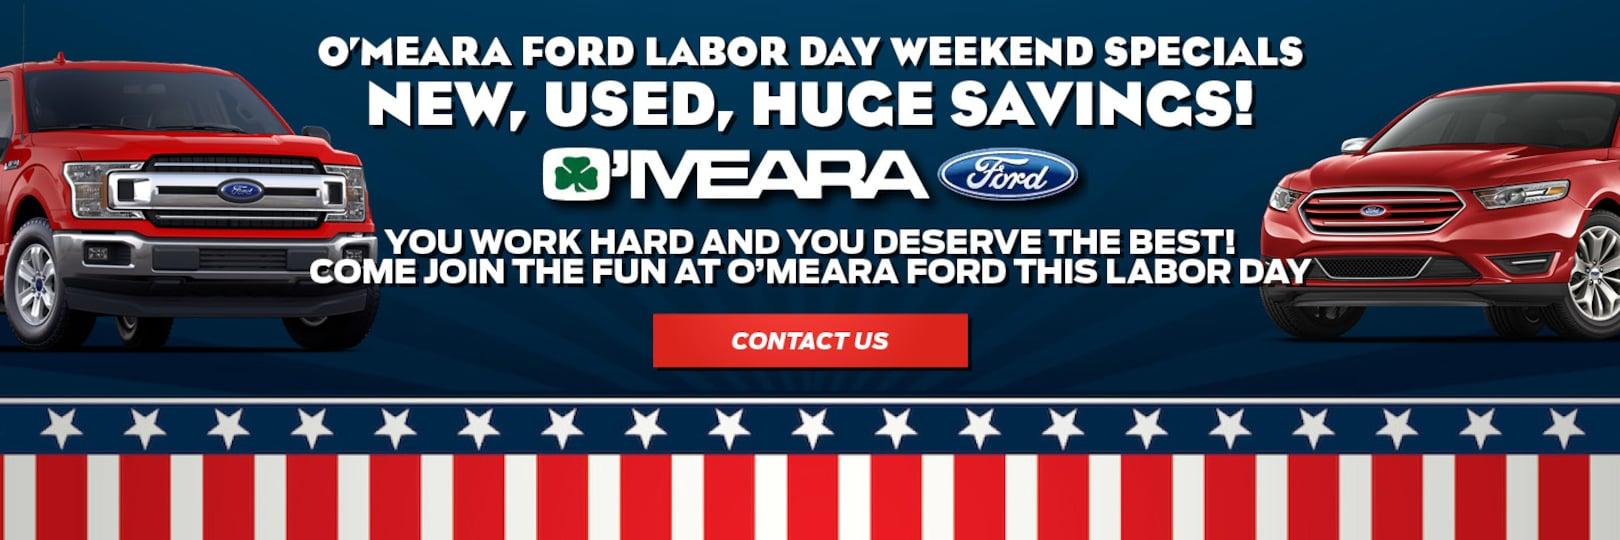 O Meara Ford >> New Ford Used Car Dealer In Northglenn Co O Meara Ford